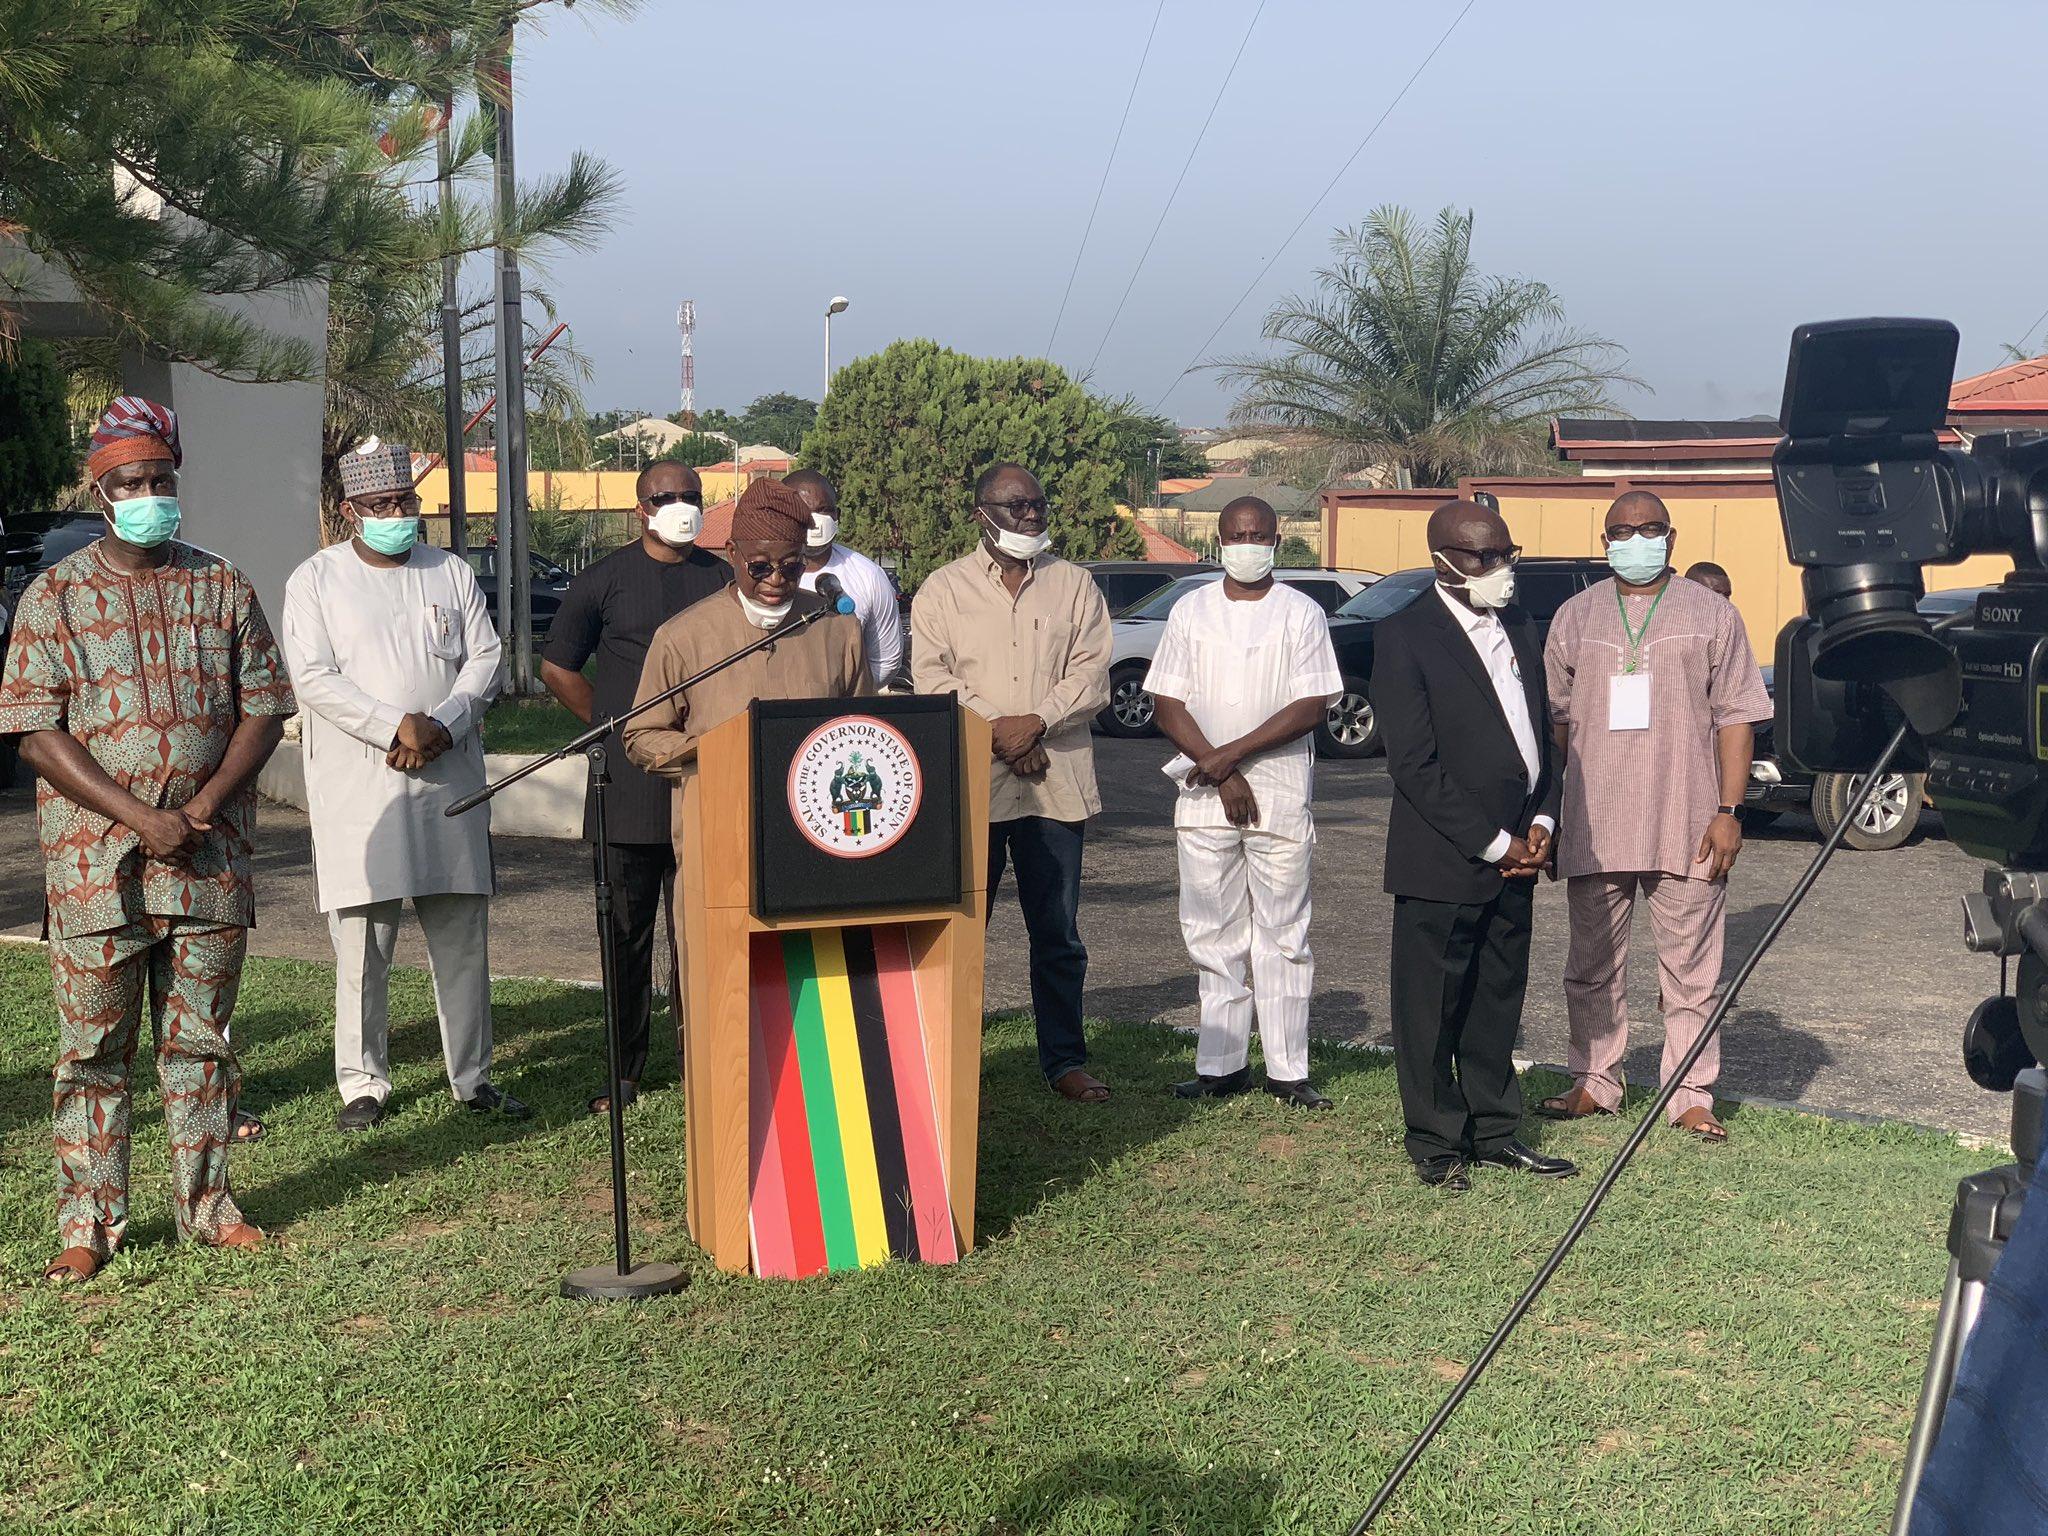 Osun Coronavirus patients have high viral load - Governor Oyetola